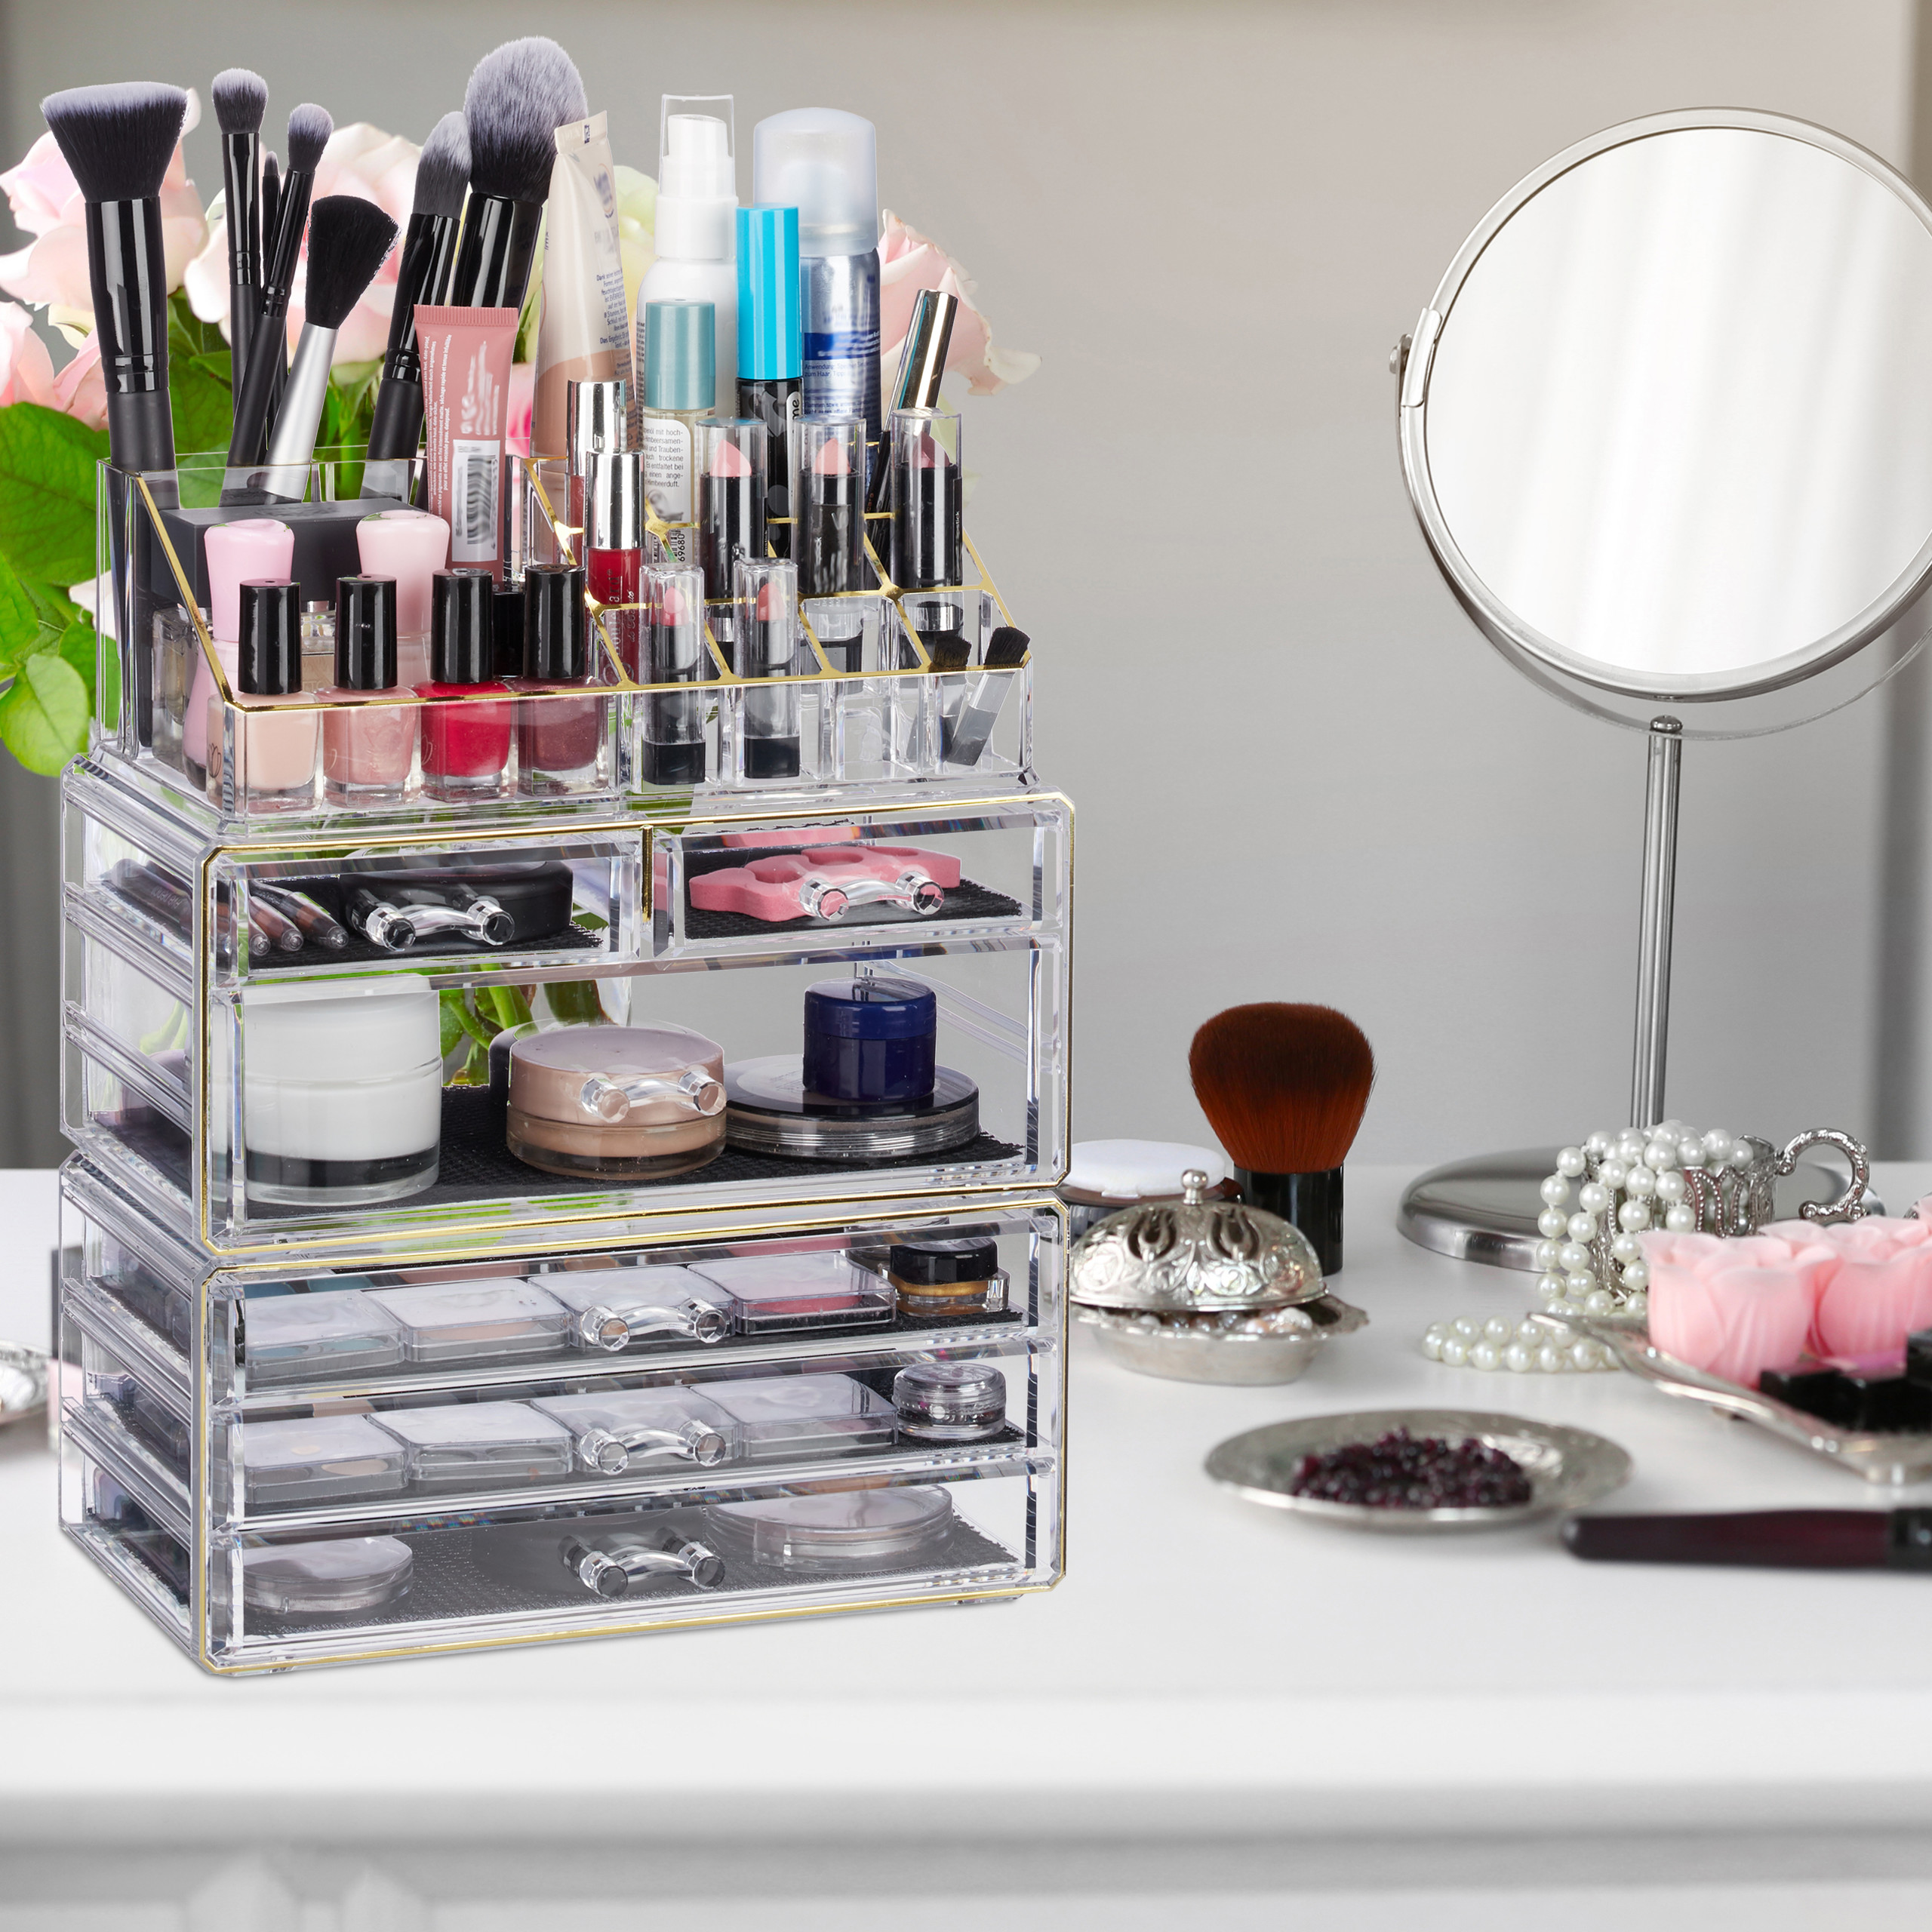 make-up-organizer-met-6-lades-acryl-cosmeticahouder-make-up-cosmetica-opslag miniatuur 11